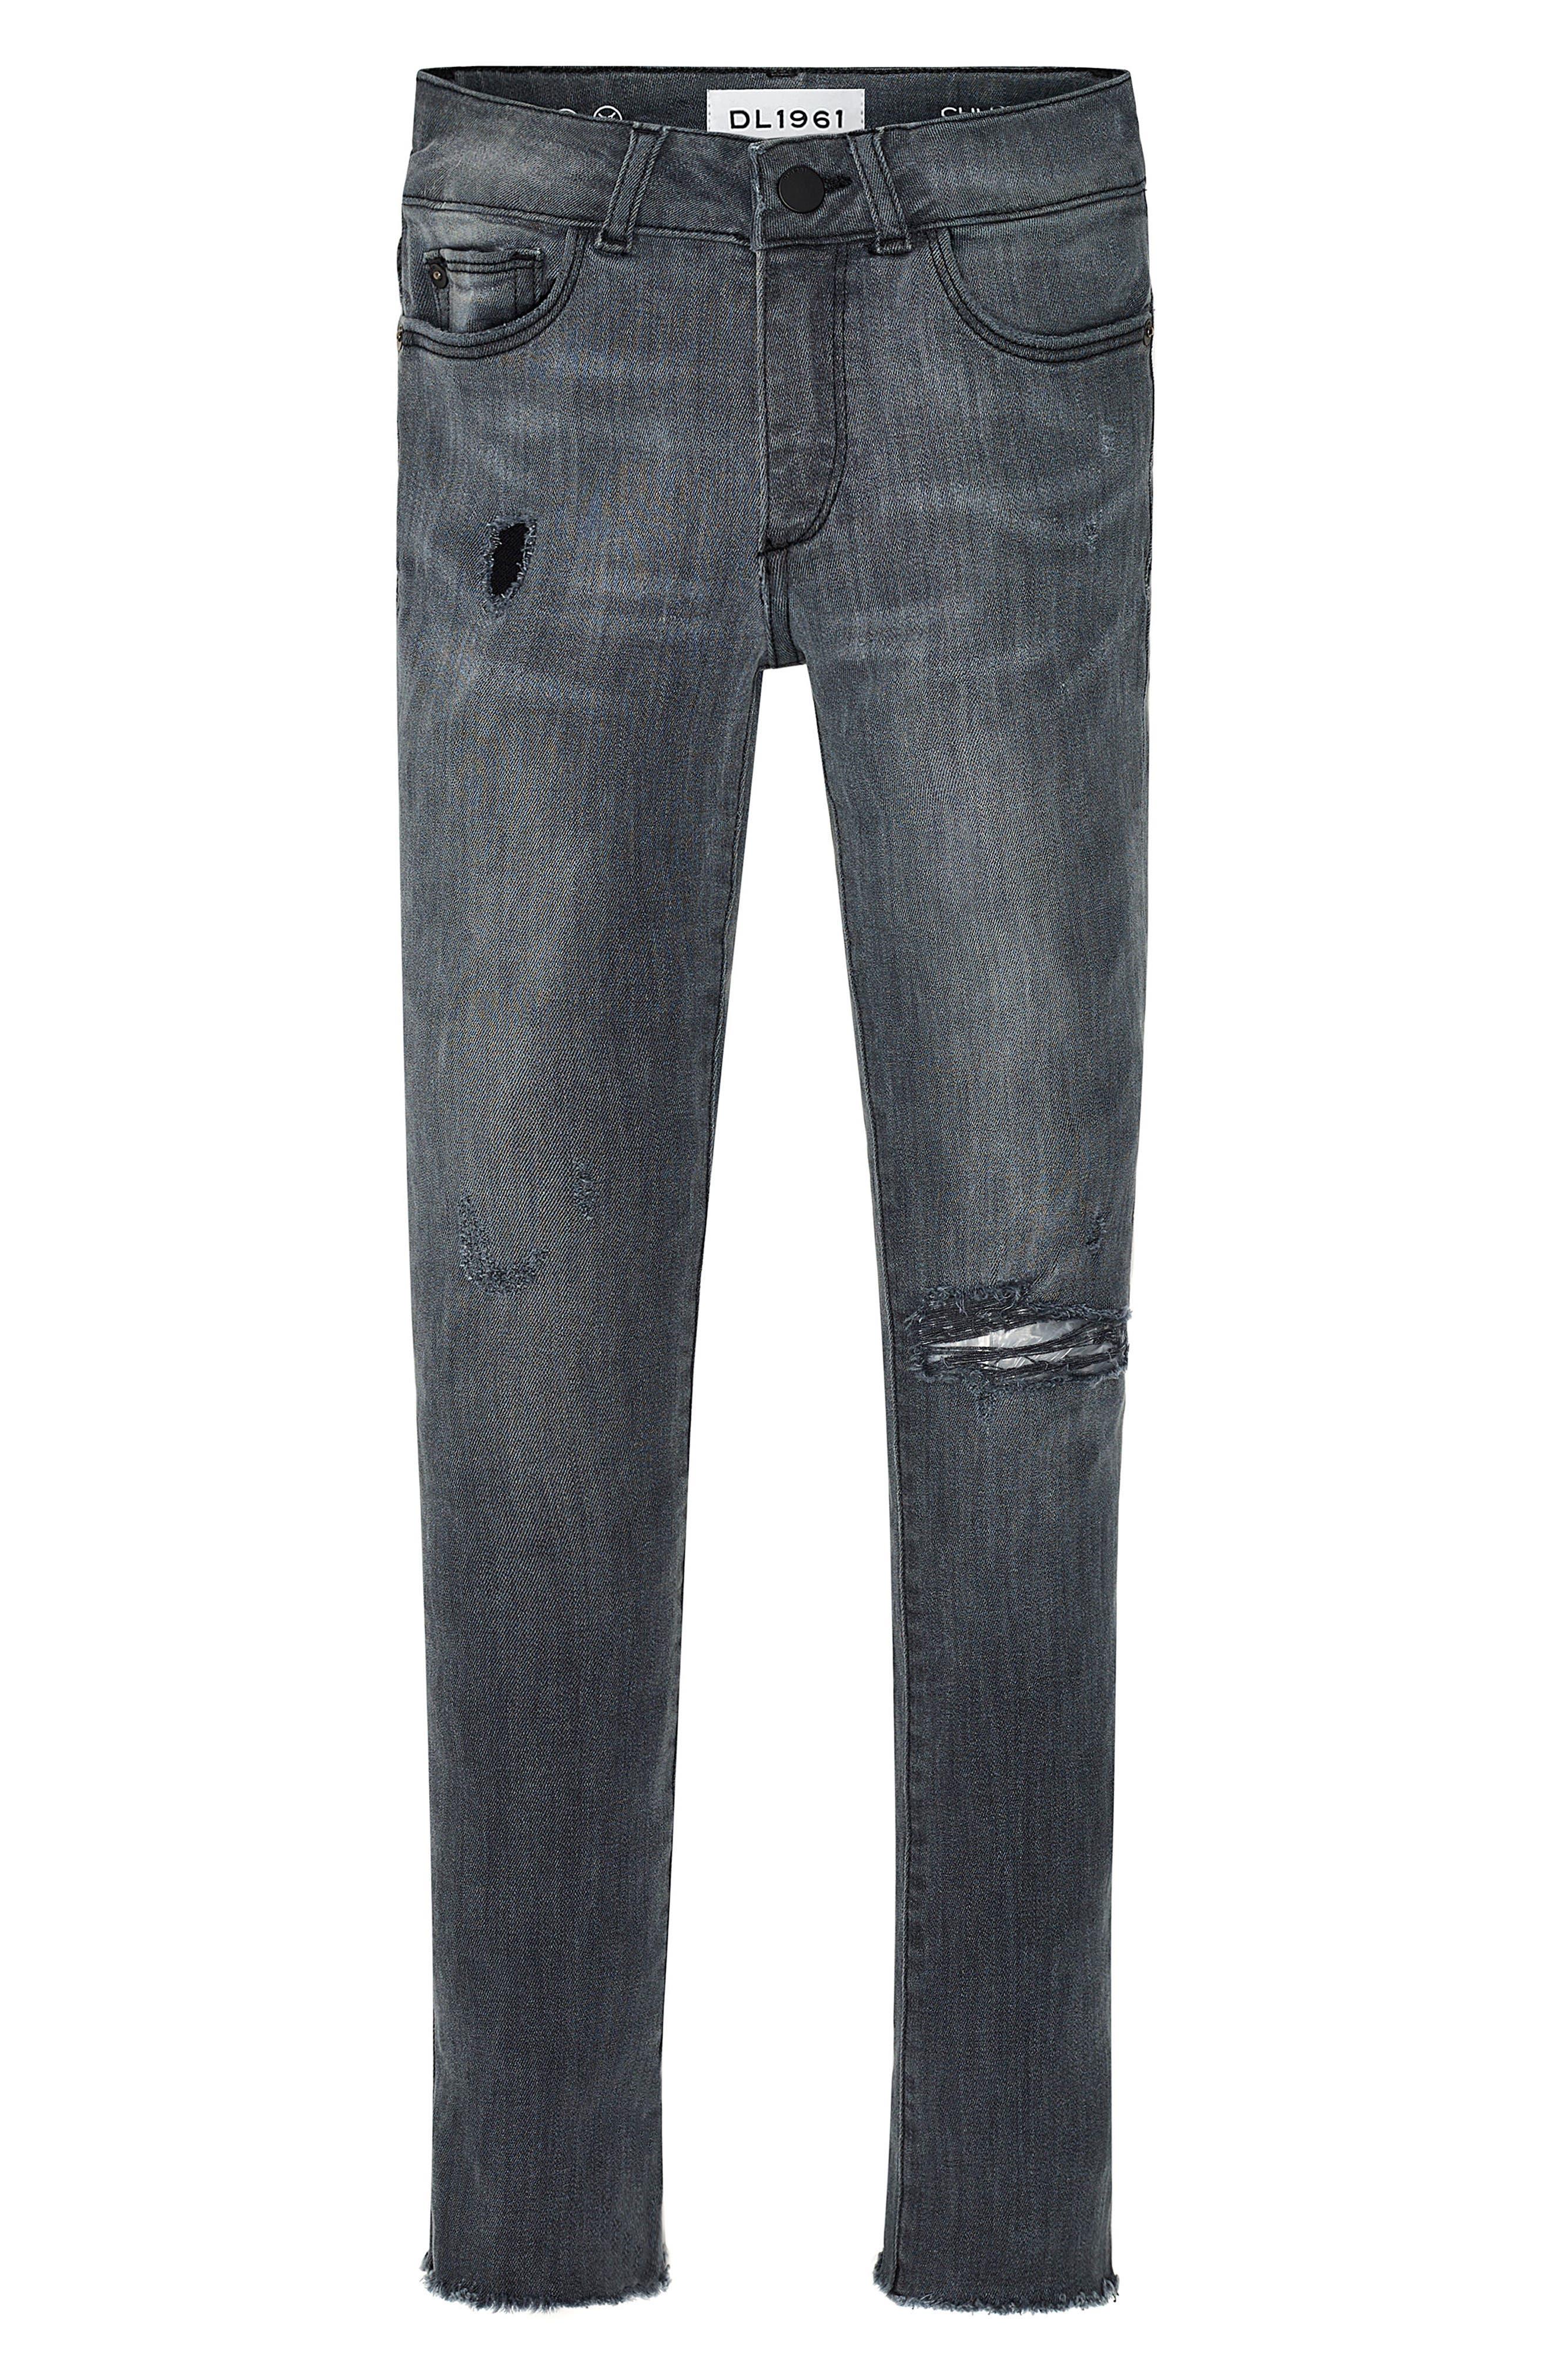 Alternate Image 1 Selected - DL1961 Chloe Raw Hem Skinny Jeans (Big Girls)